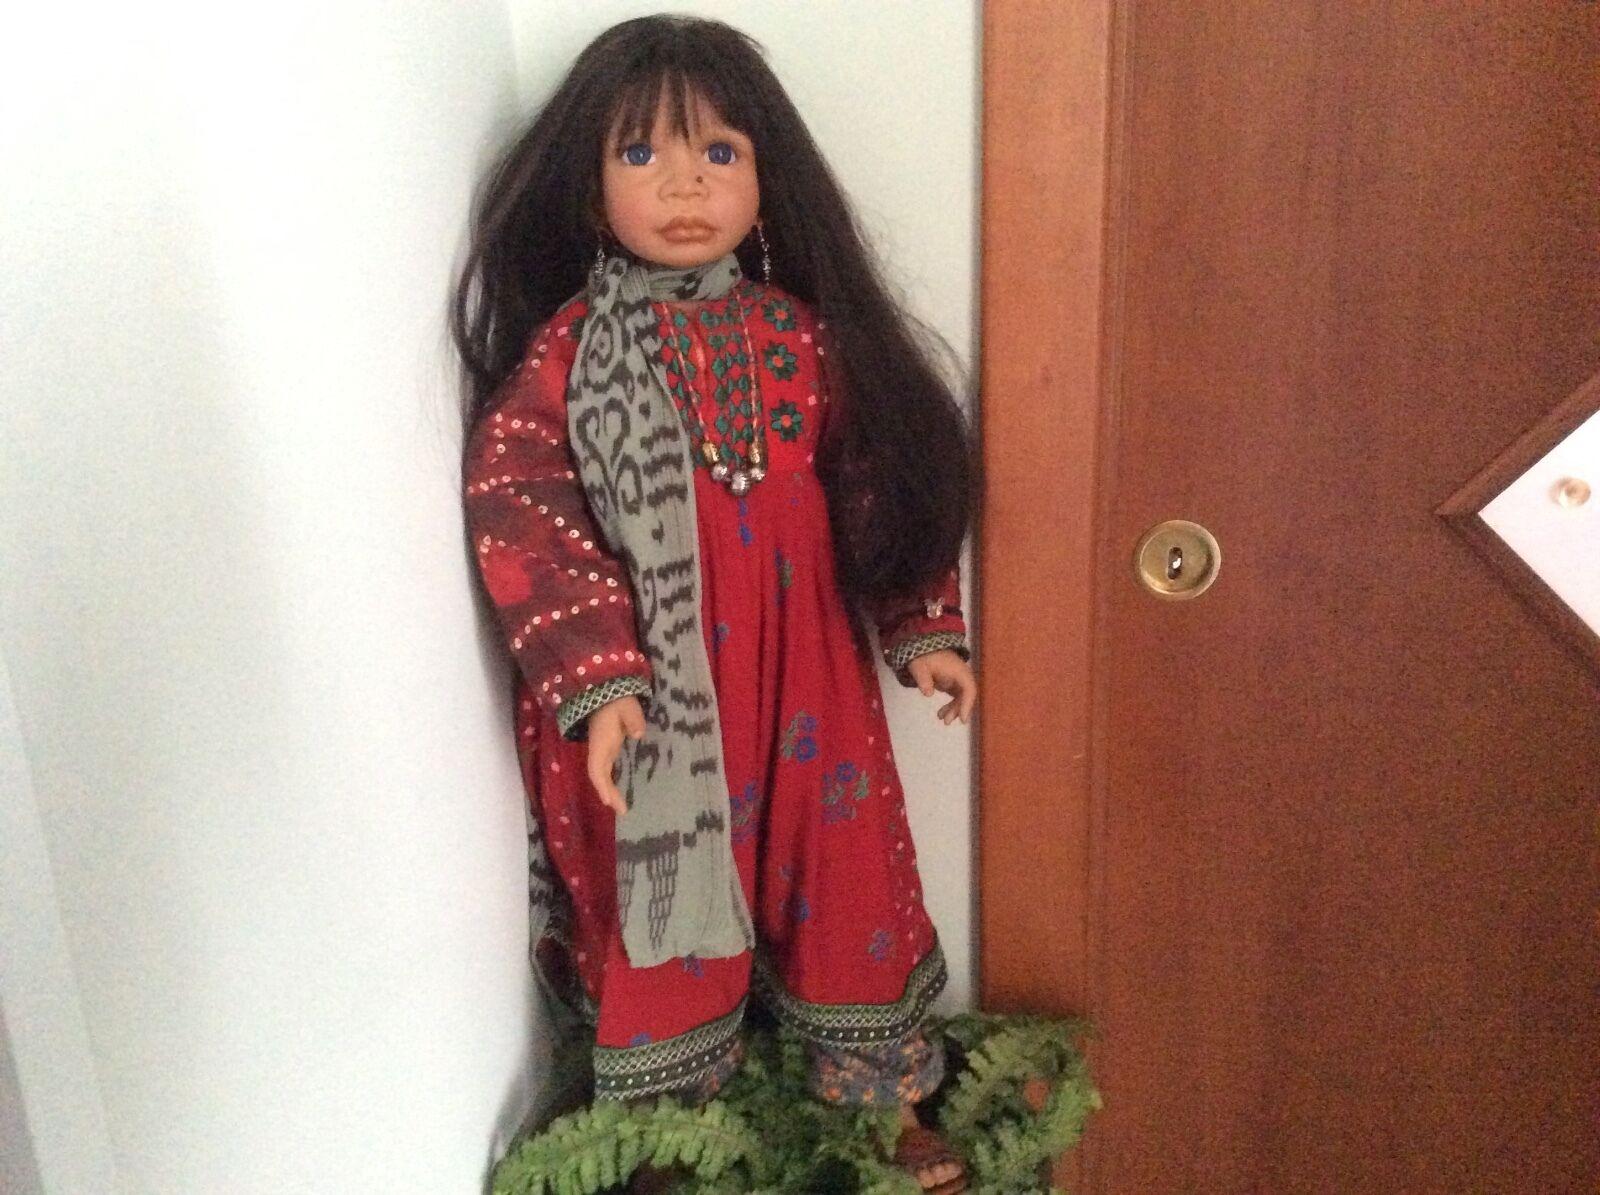 Bambola Dell'artista Angela Sutter Vintage Doll bellissima collezione